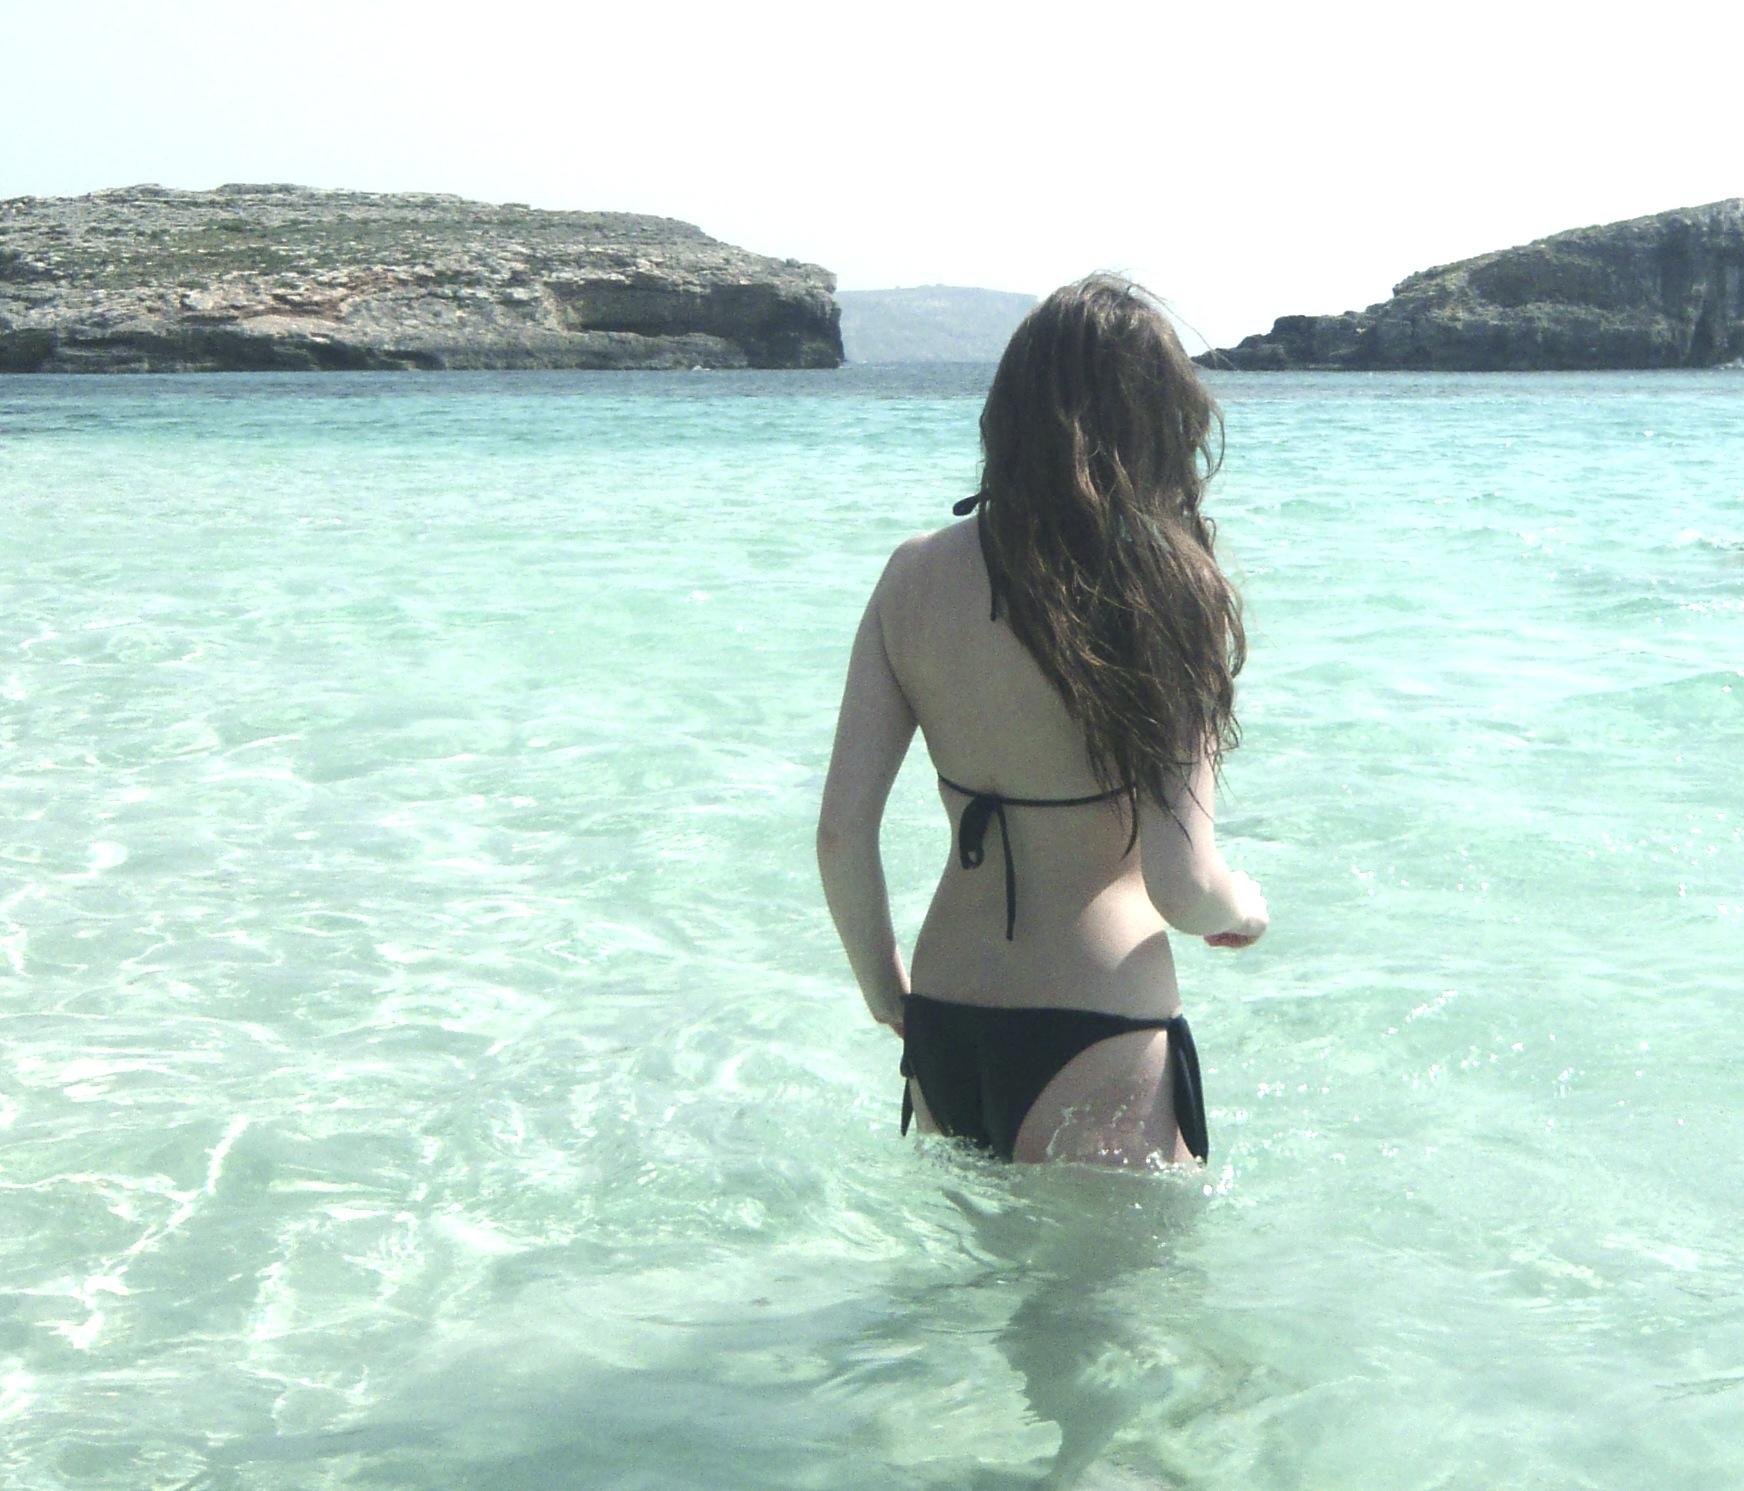 Edita a quick swim